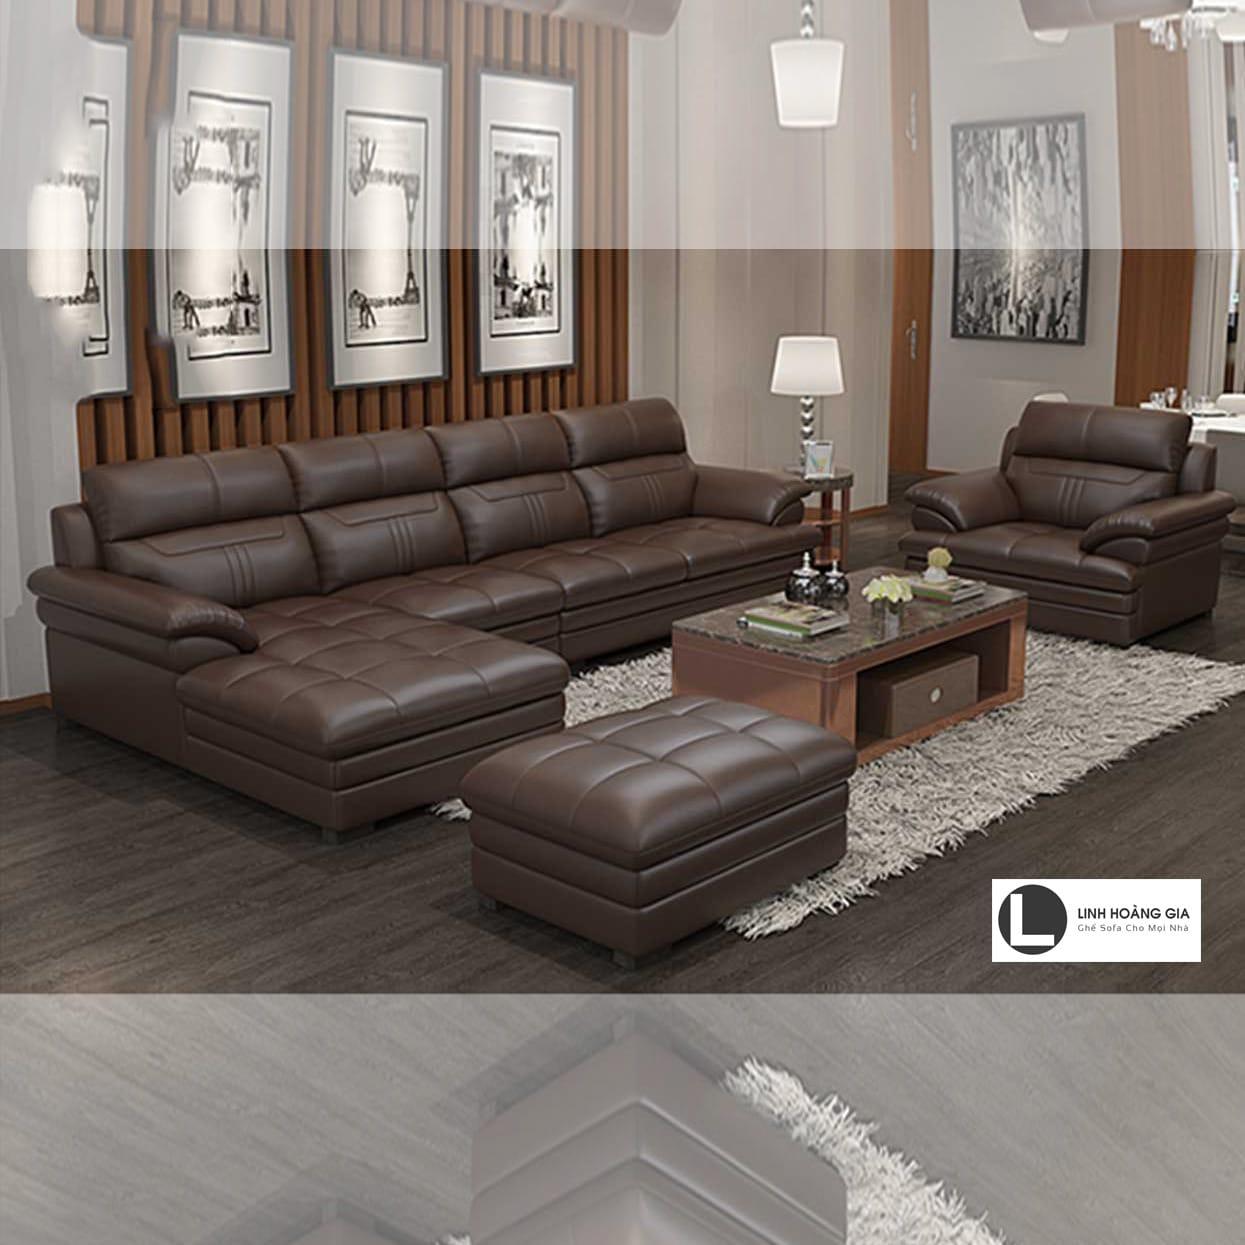 Ghế Sofa cao cấp LHG 186